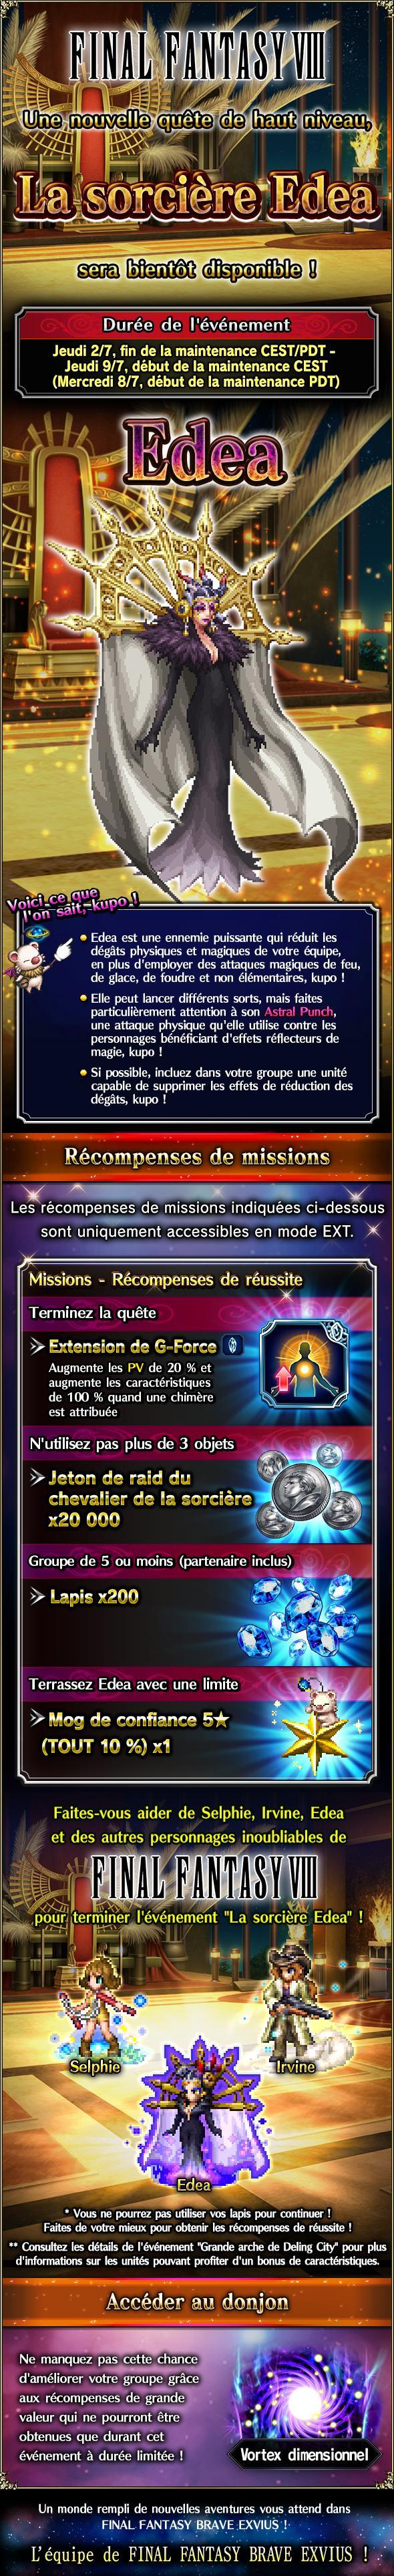 Trial de Raid - FFVIII - La sorcière Edea - du 02/07 au 09/07/20 20200630SorceressEdeaTrial